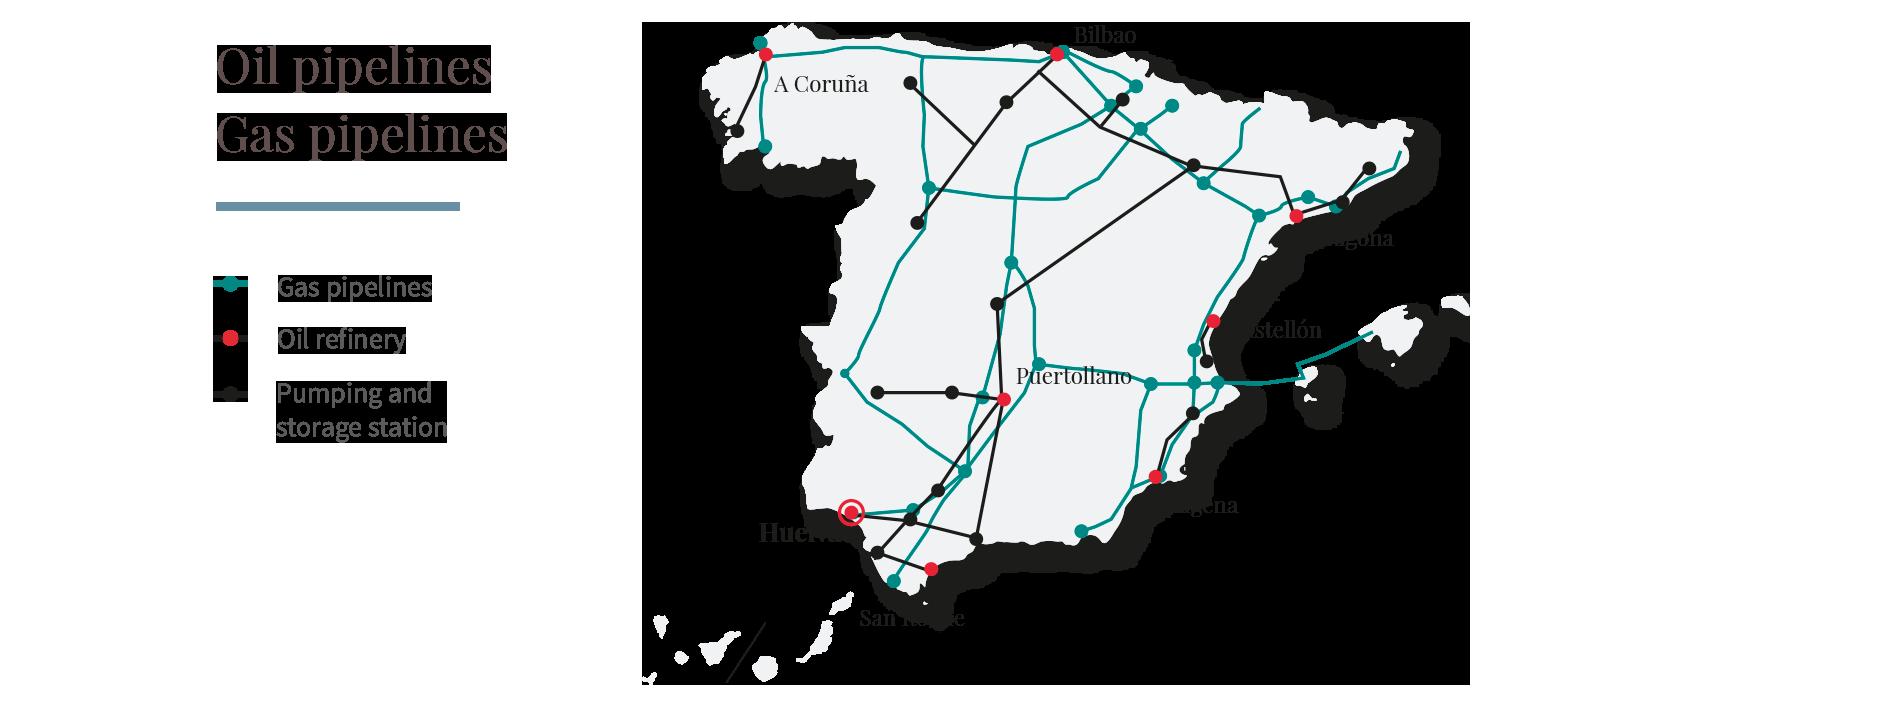 Oil pipelines Gas pipelines